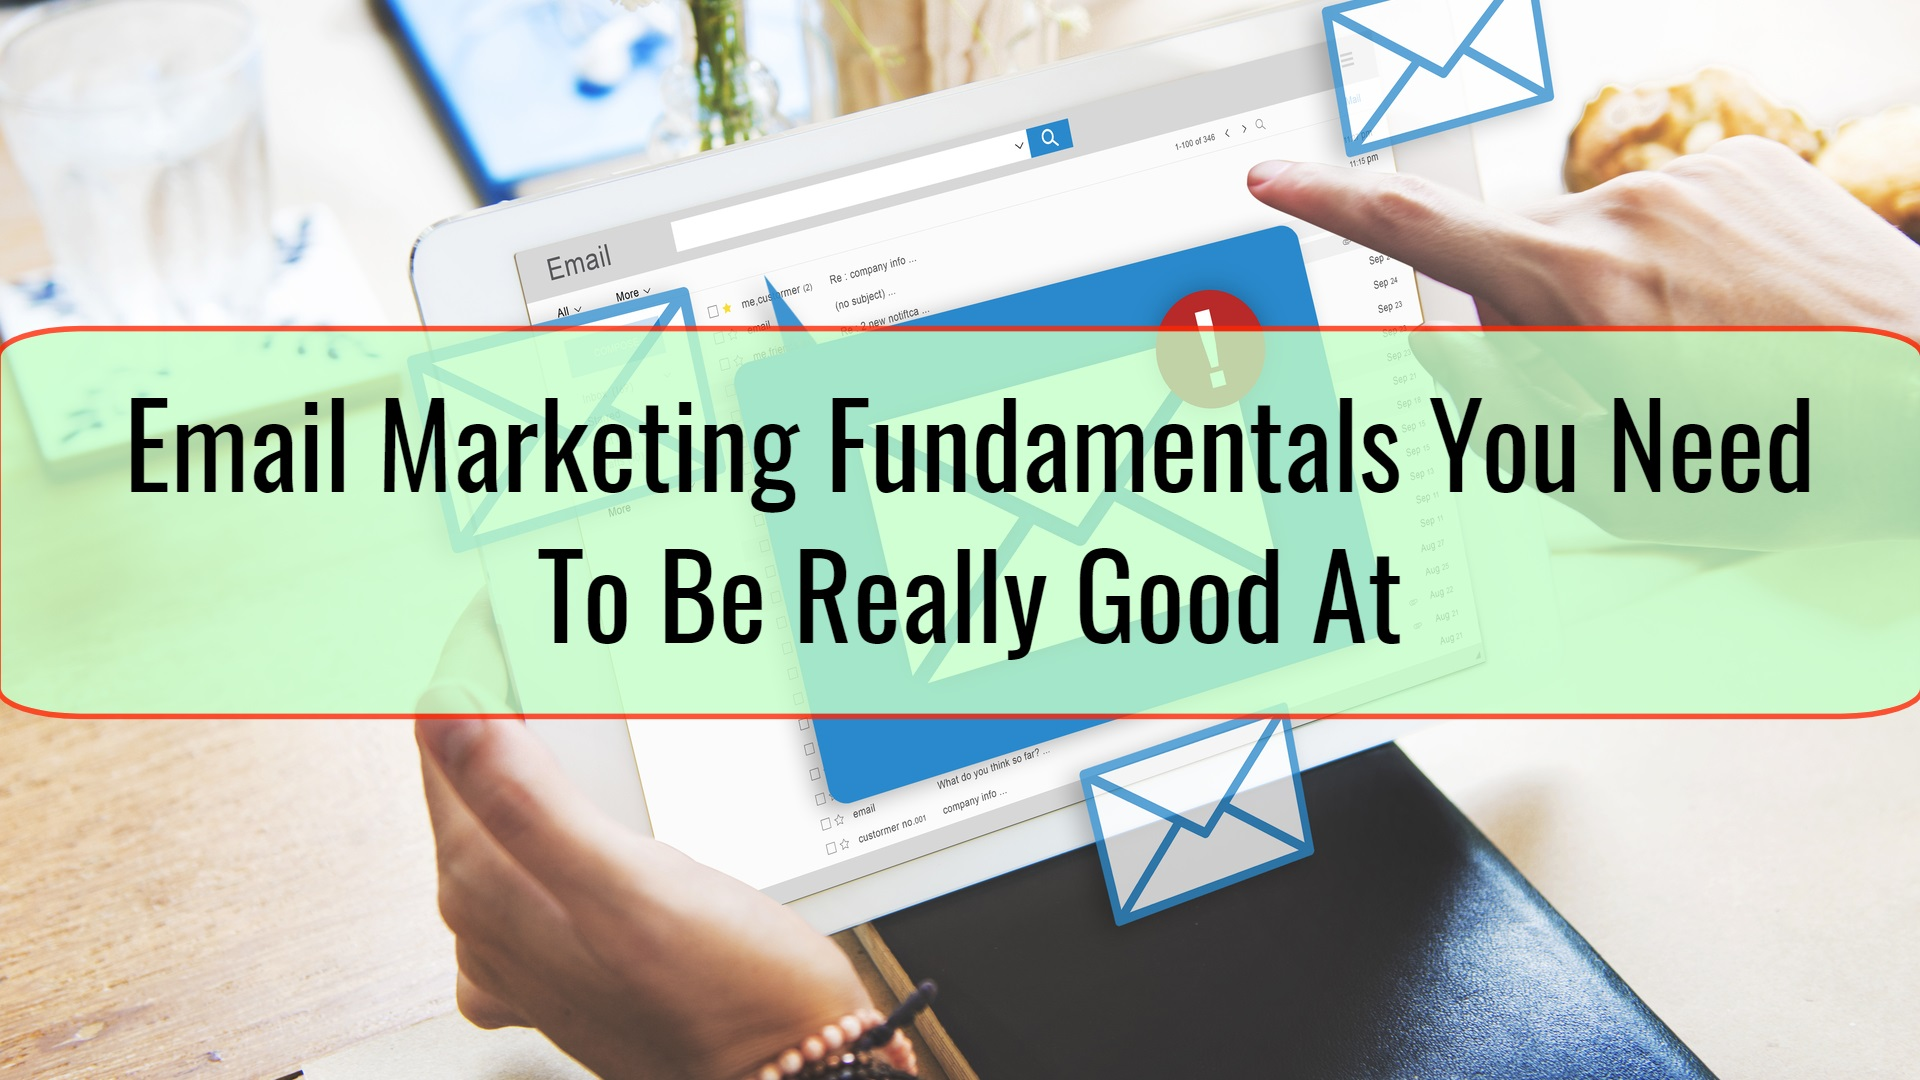 Email Marketing Fundamentals You Need To Be Really Good At